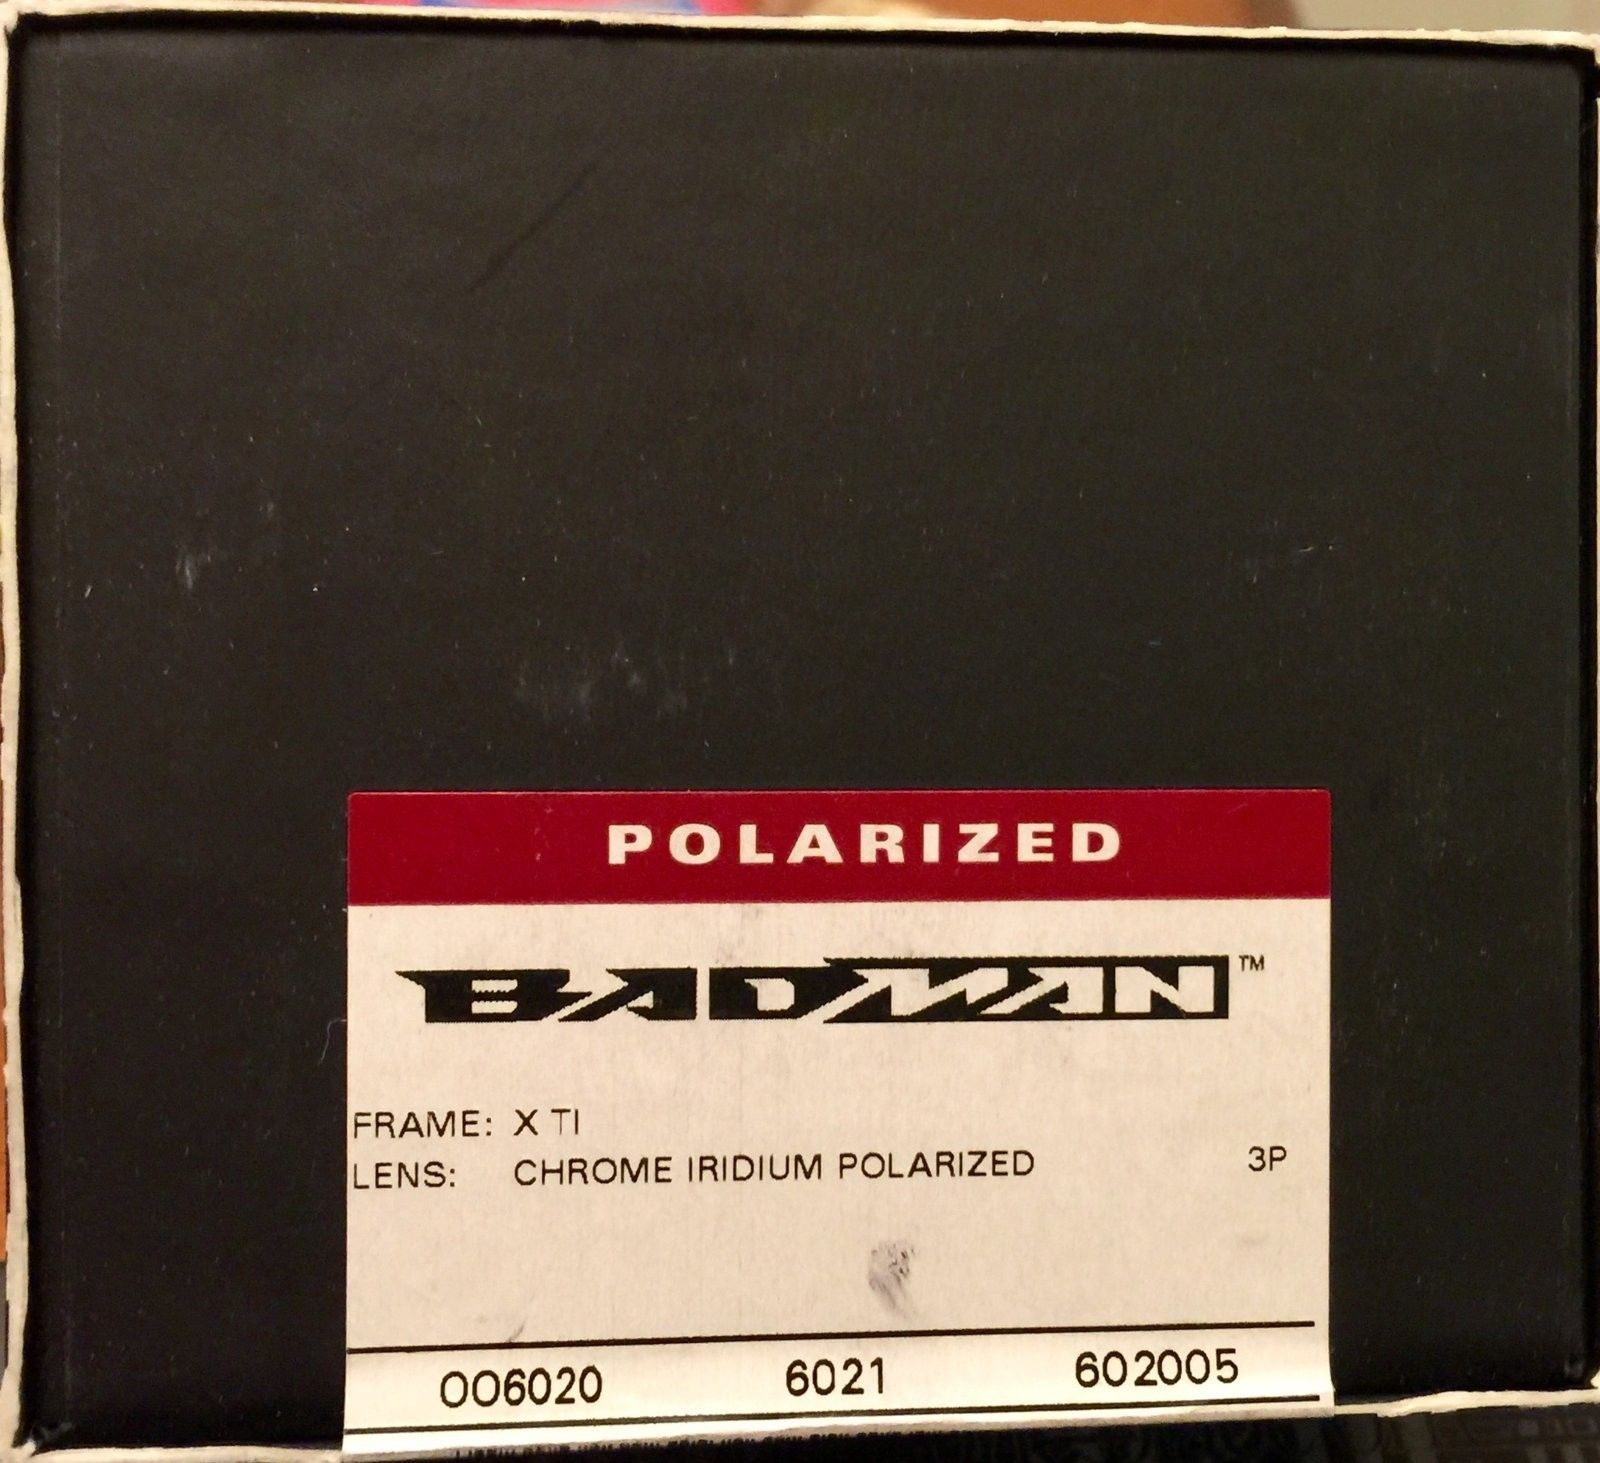 NIB Badman X Titanium / Chrome Iridium Polarized (Sealed Box & Complete) - image.jpeg